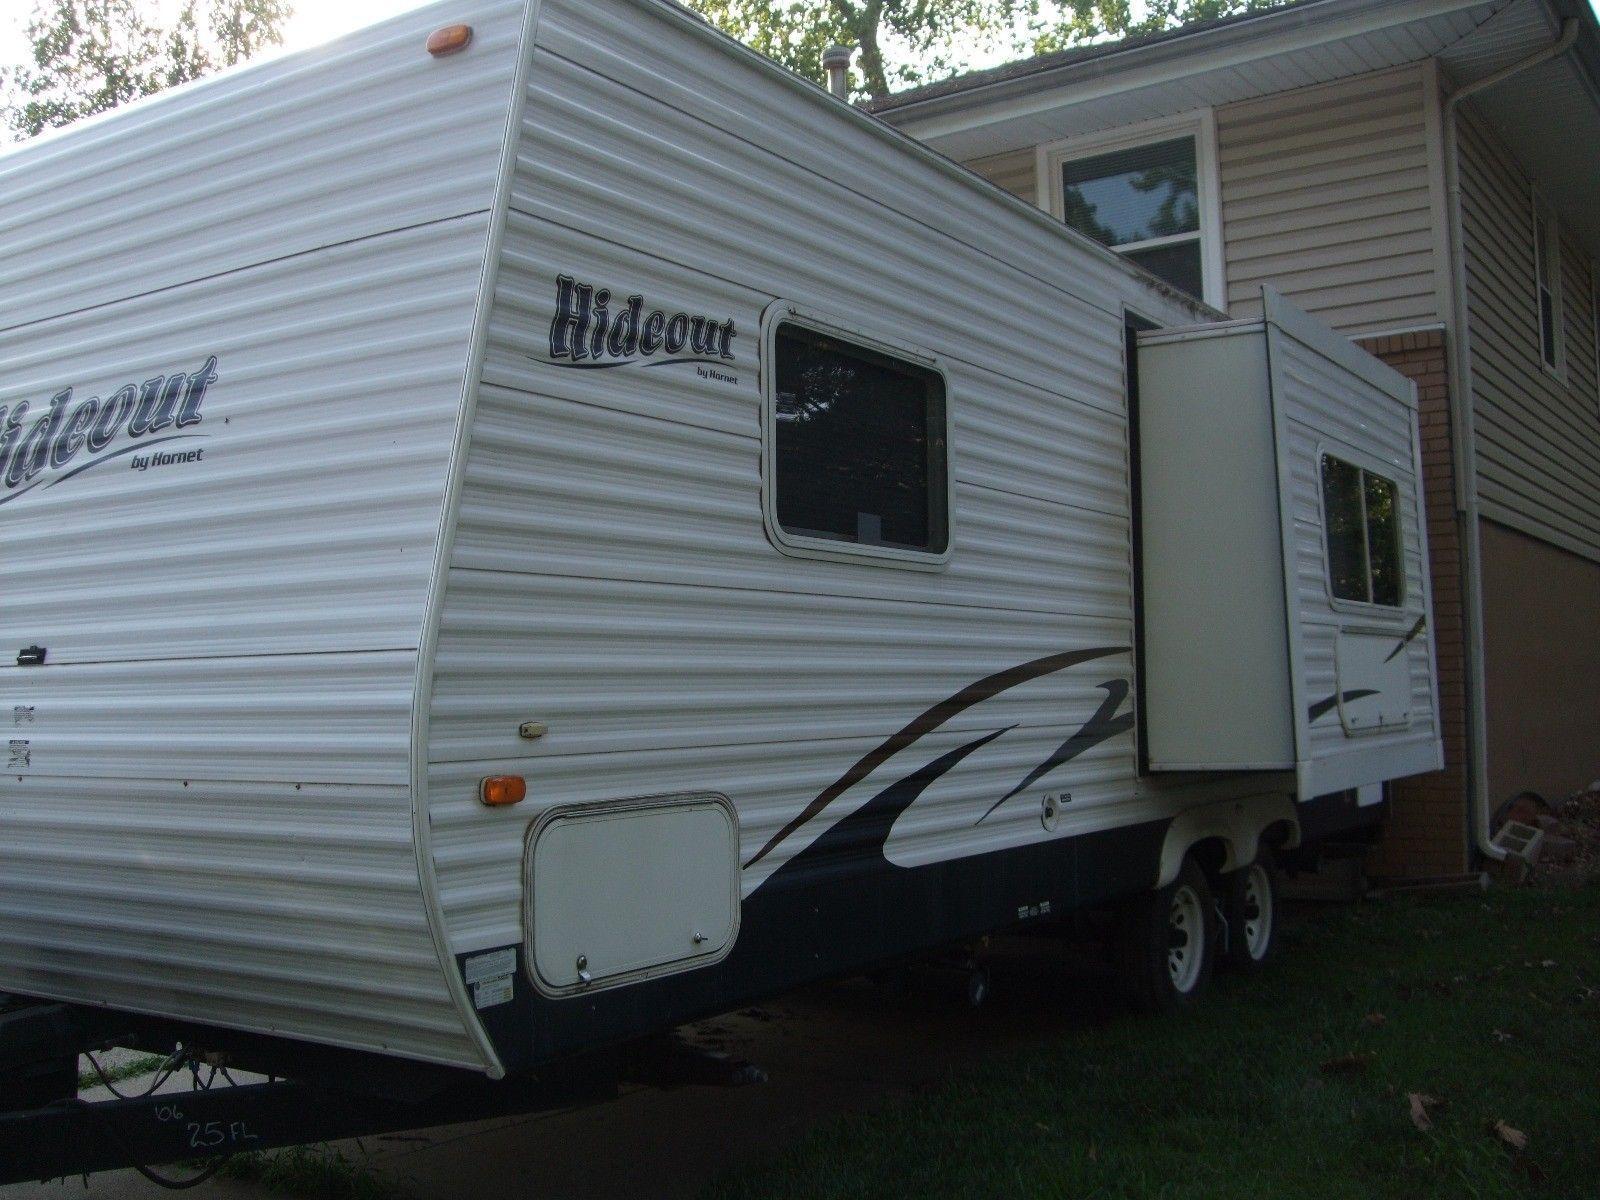 Gently used 2007 Keystone Hideout camper